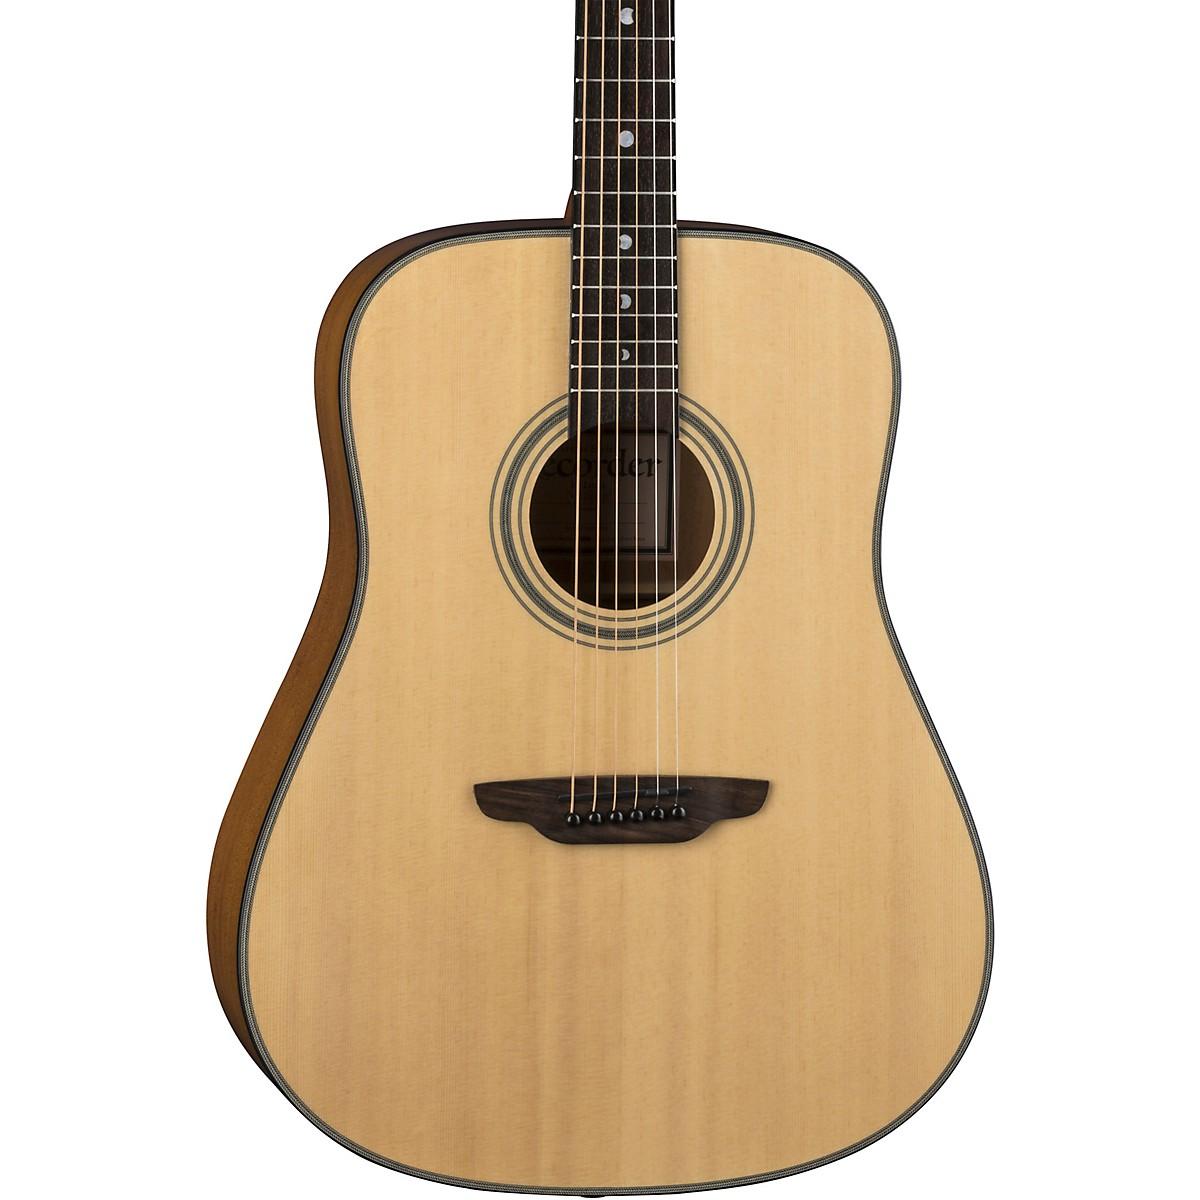 Luna Guitars Art Recorder Dreadnought Acoustic Guitar